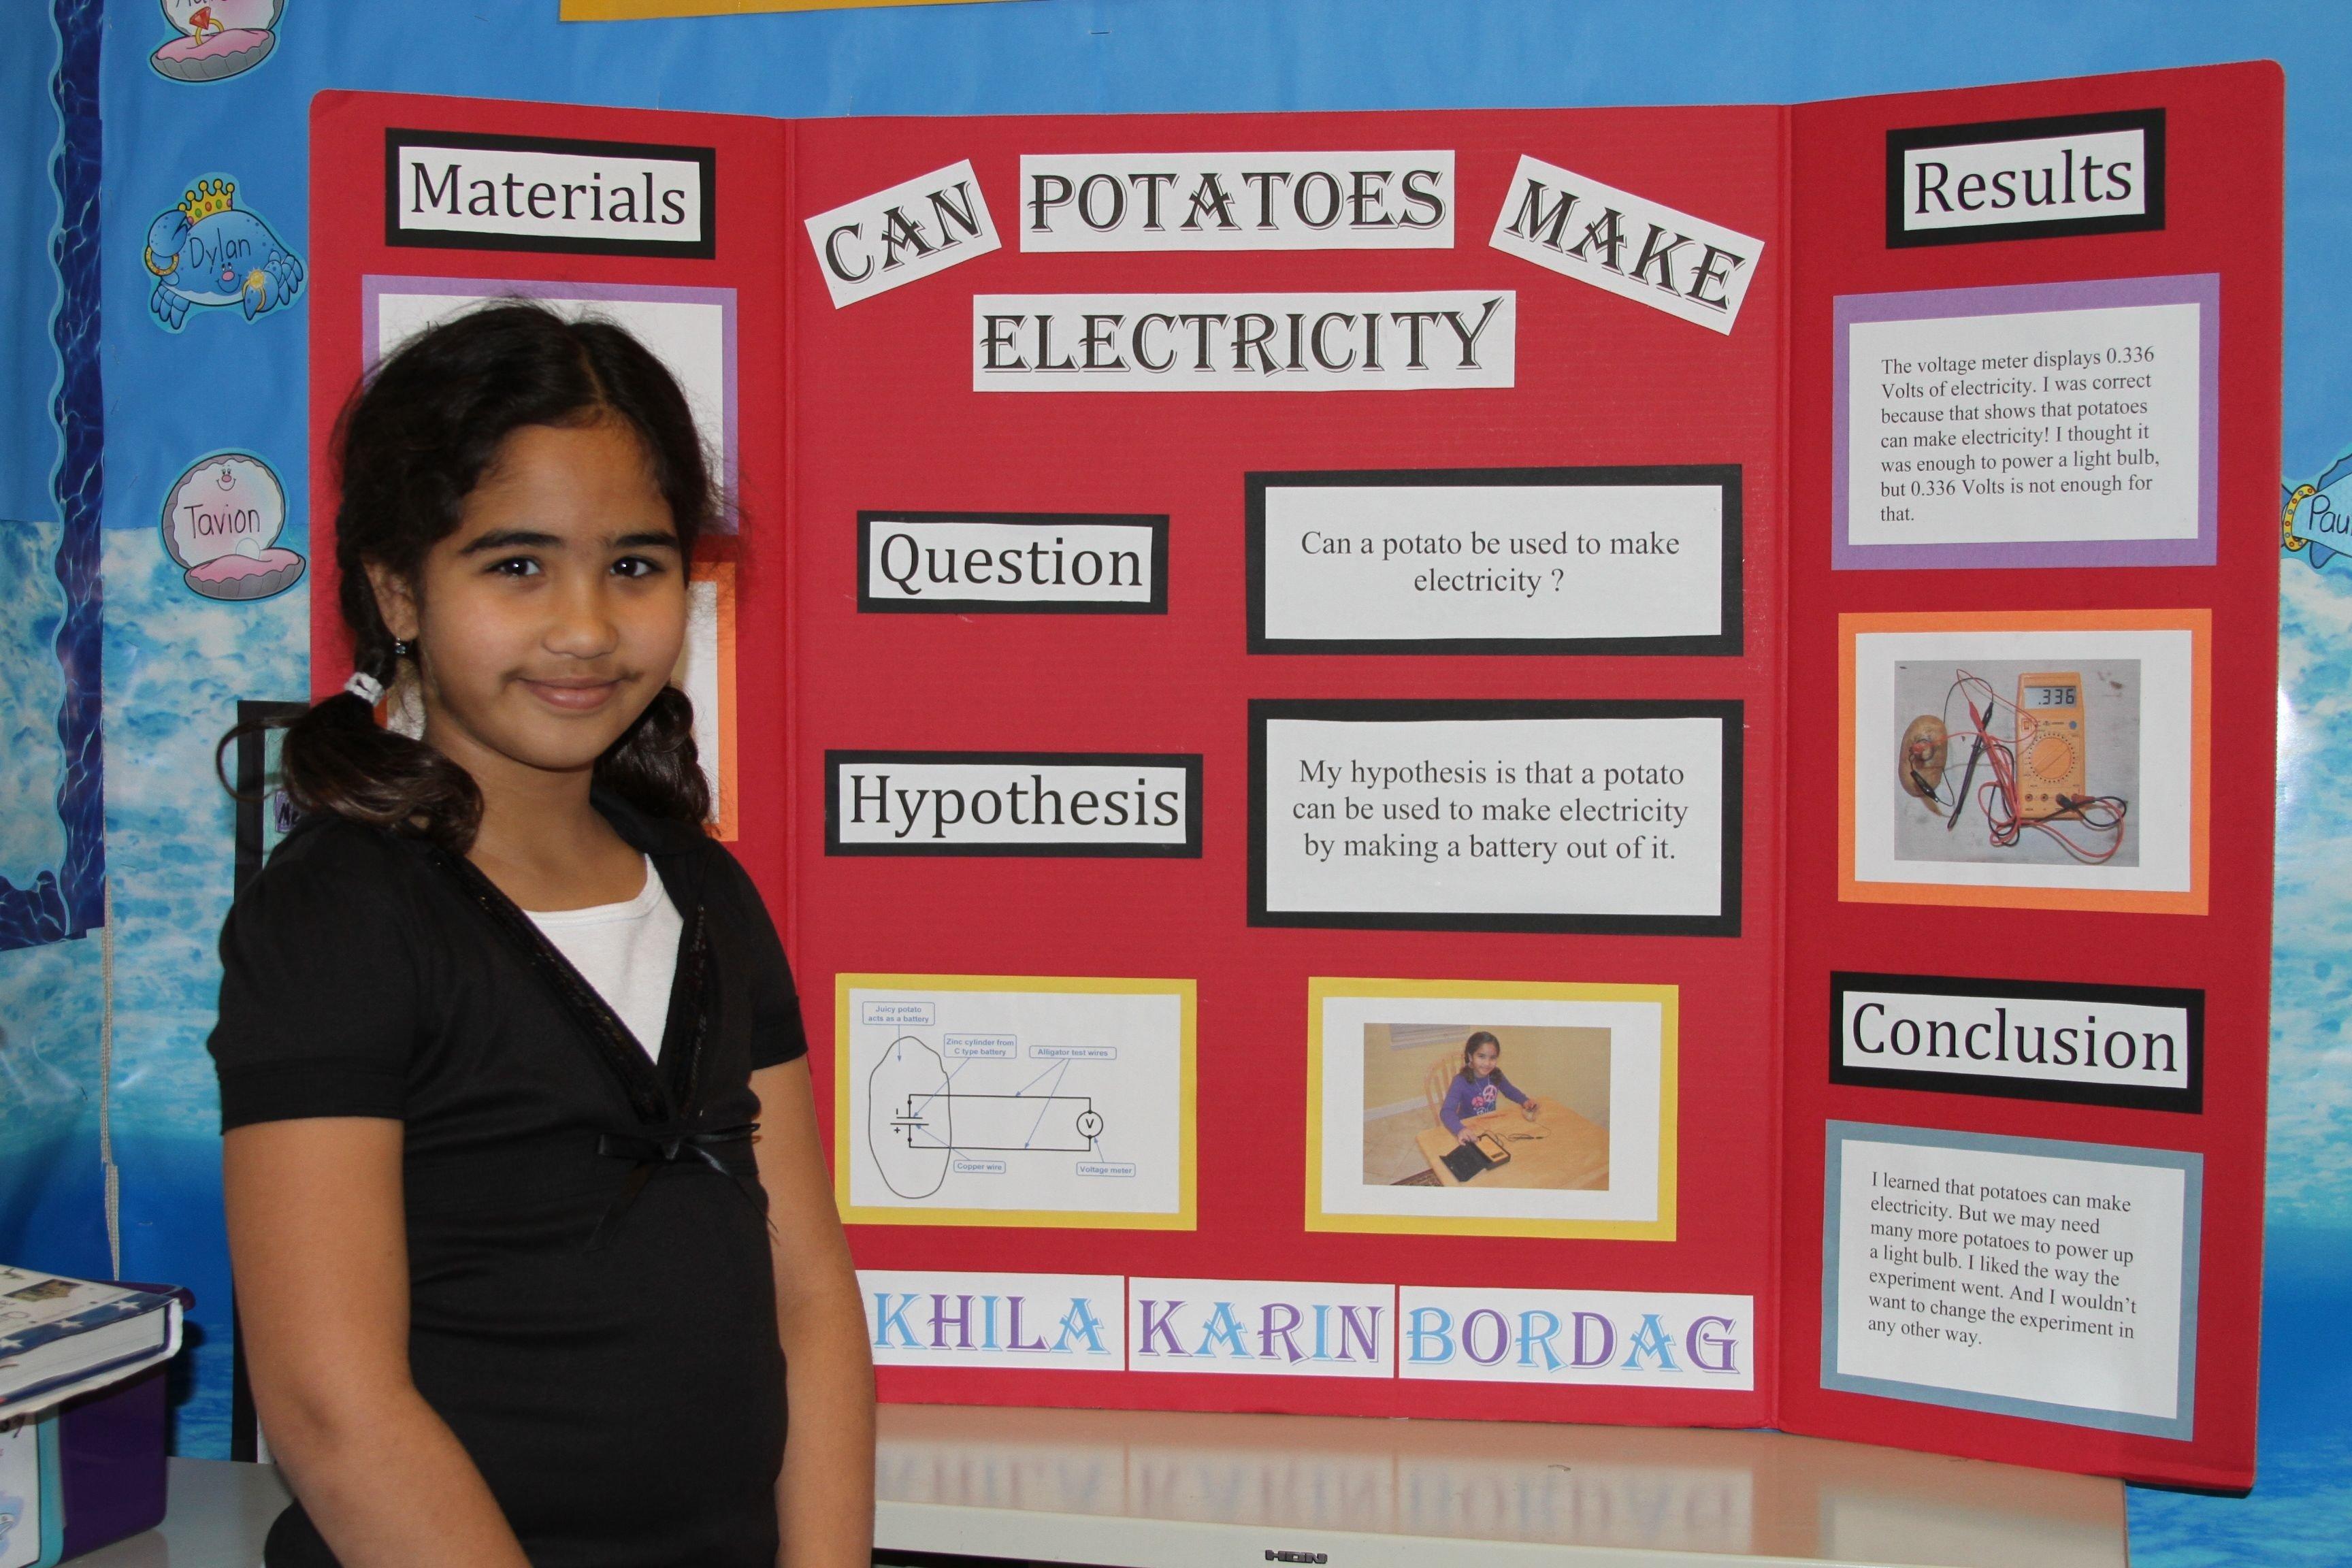 10 Pretty Elementary School Science Fair Project Ideas high school science fair projects green elementary school science 3 2020